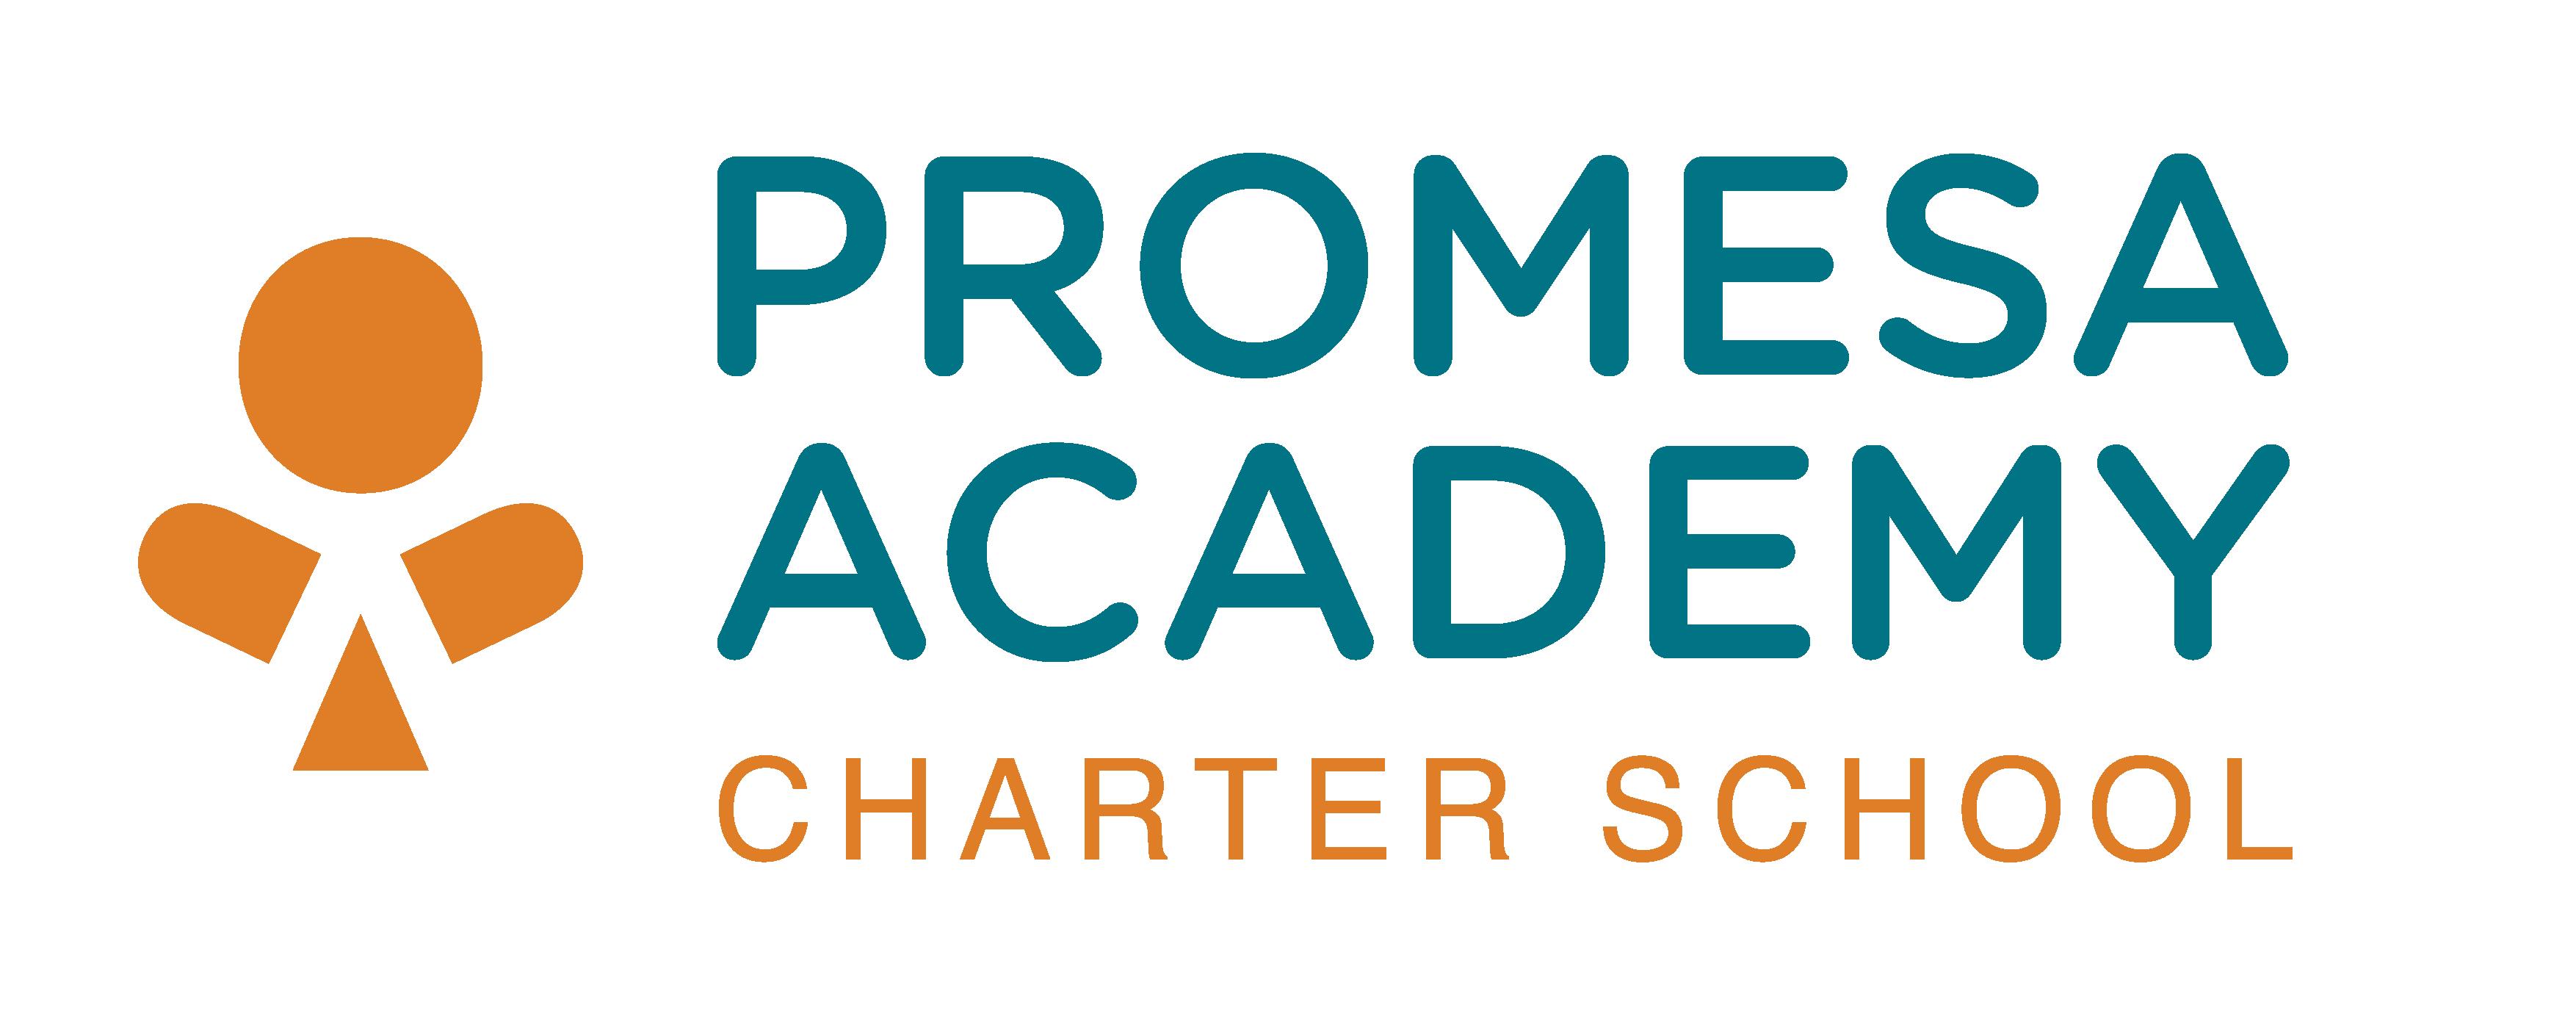 Promesa Academy Charter School logo